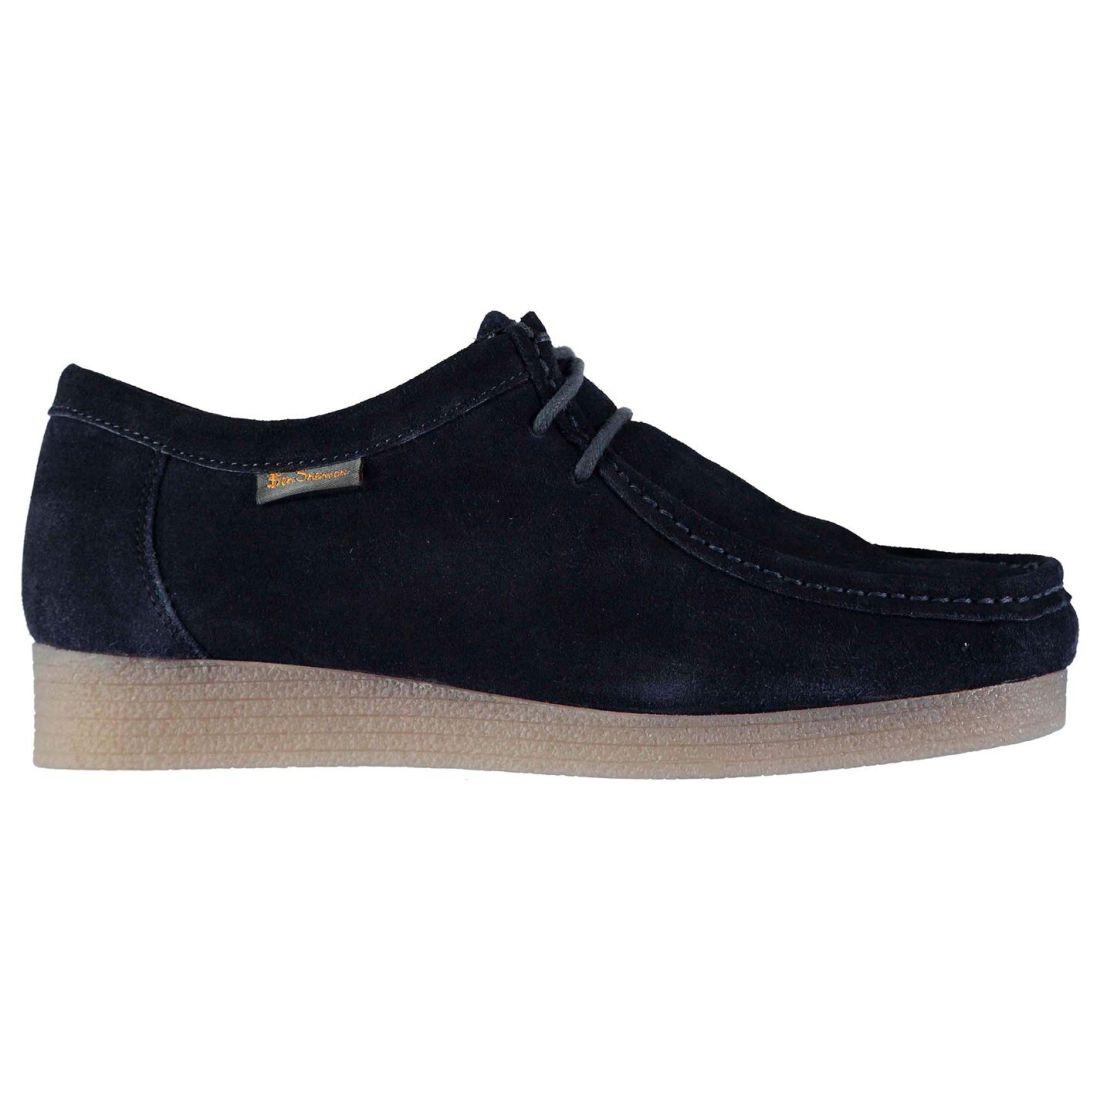 055cbc897c Ben Sherman Quad Wallabee Shoes Moc Toe Mens